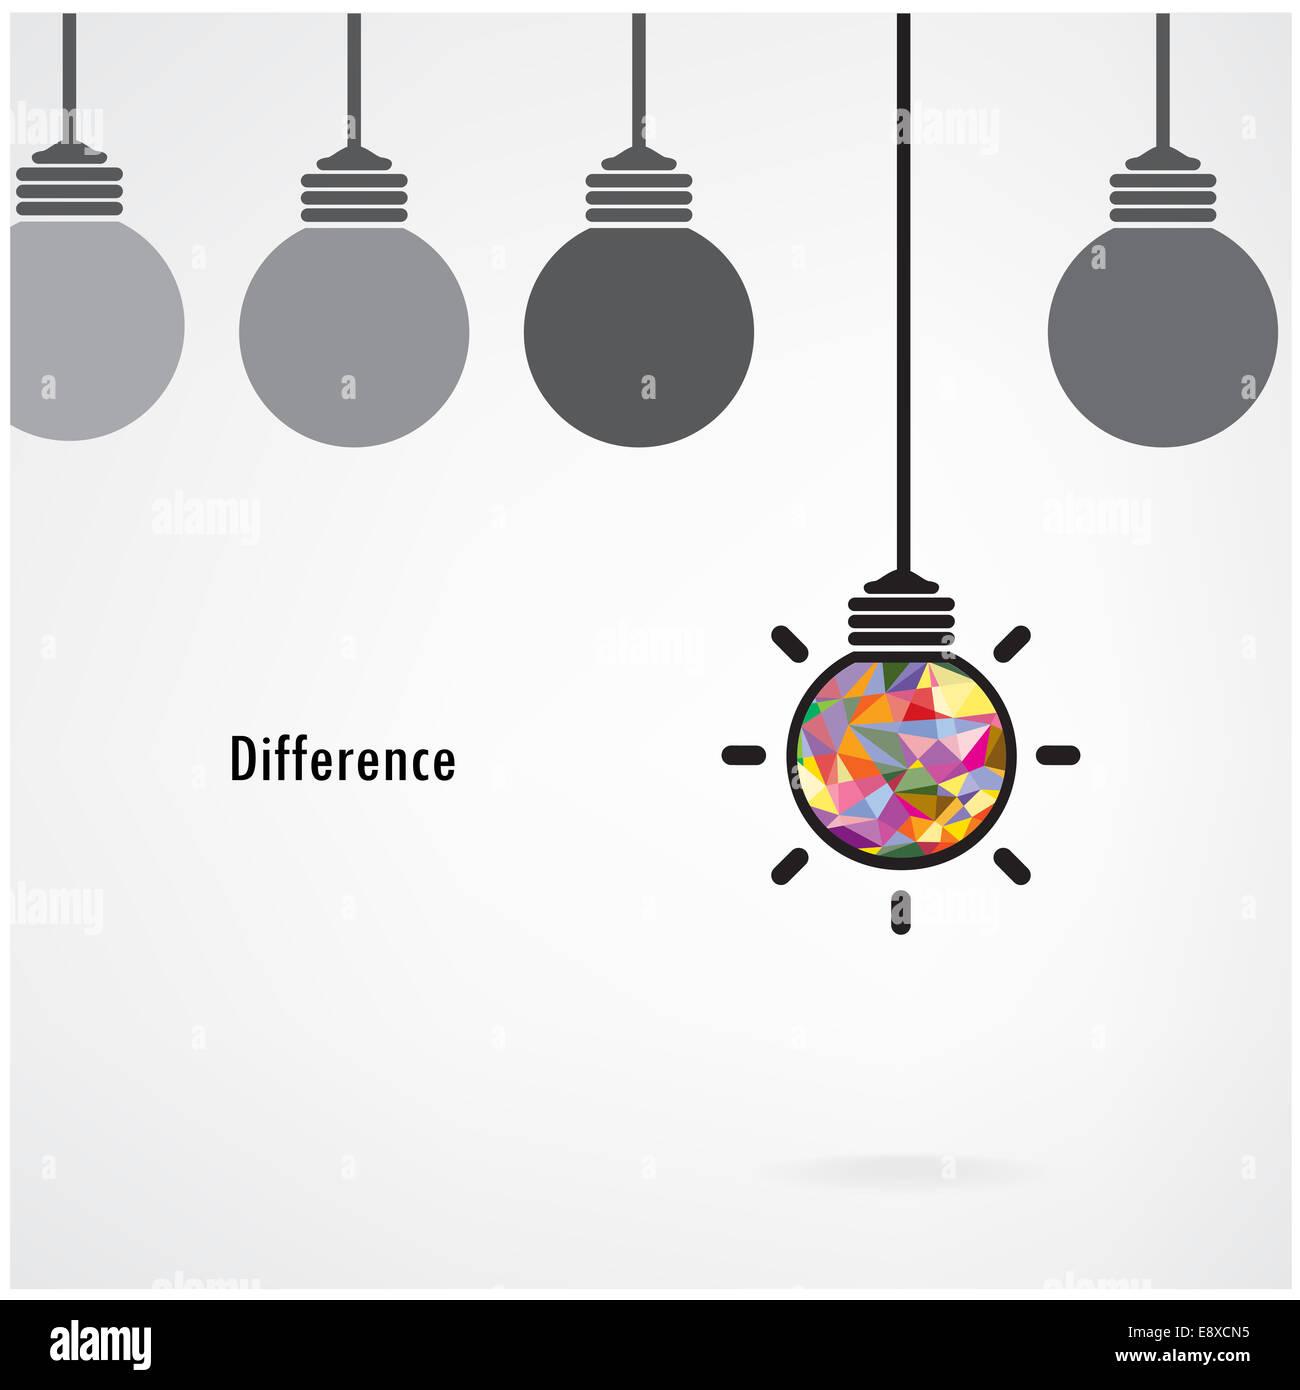 creative light bulb idea concept background design for poster flyer cover brochure business idea education background